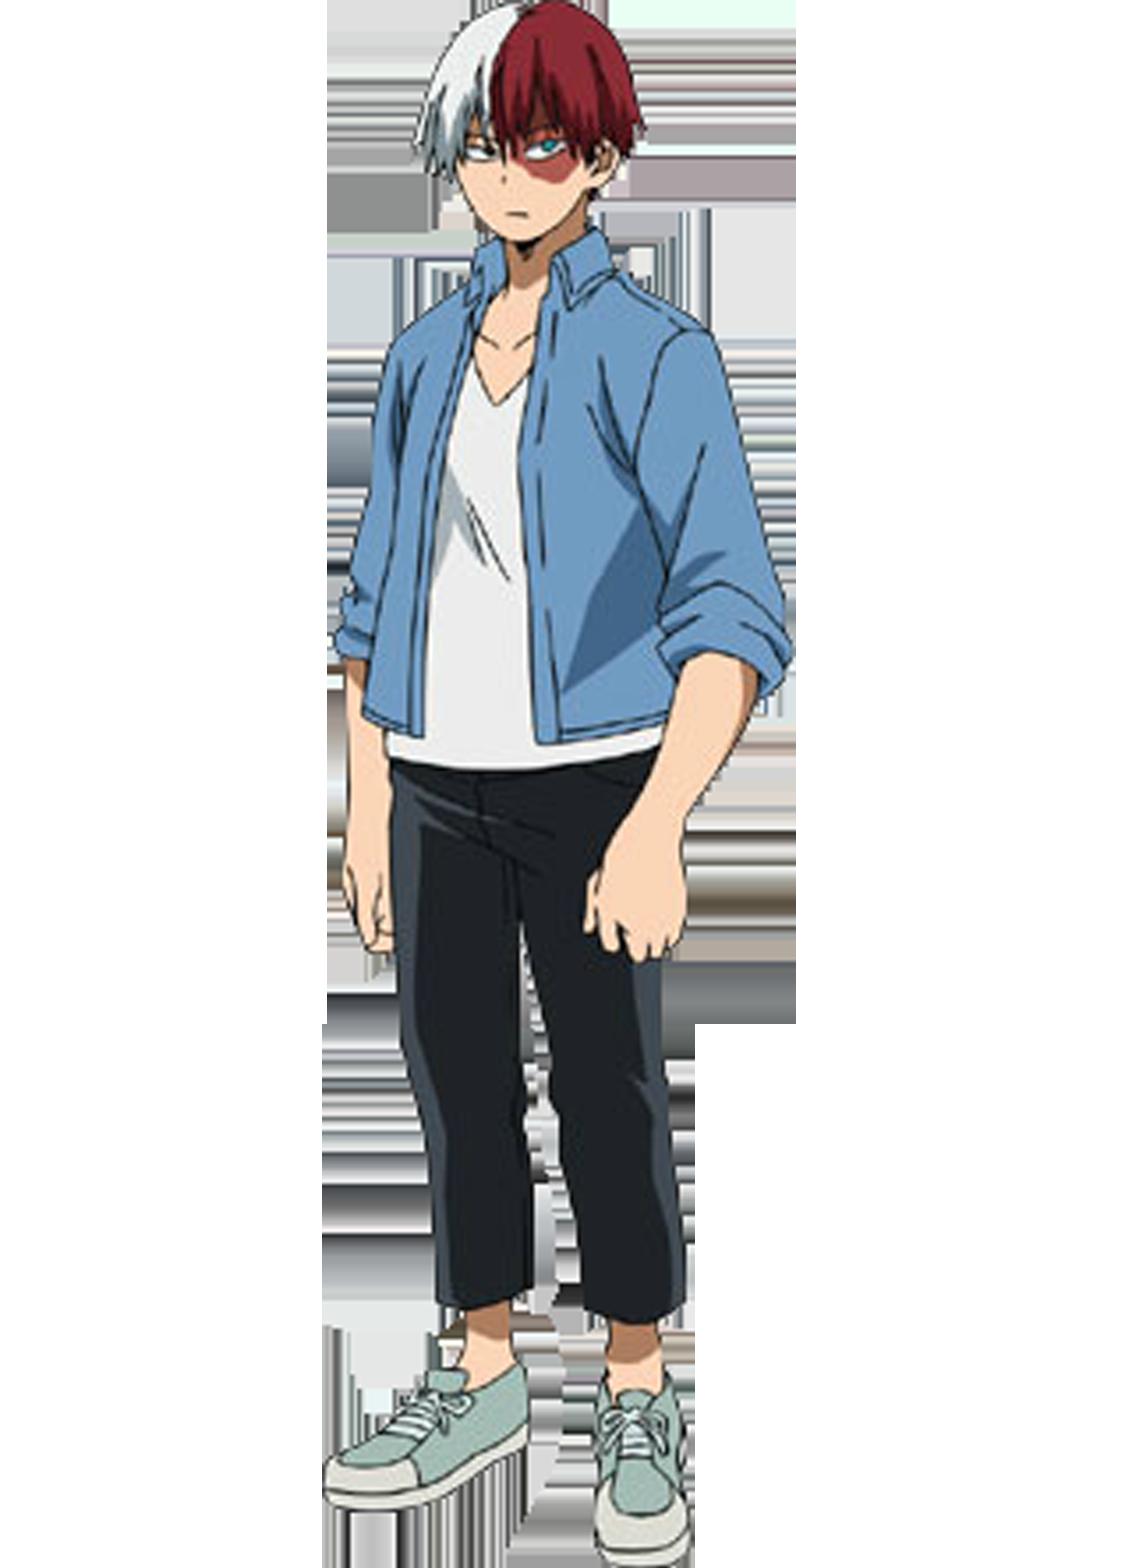 Shouto Todoroki - Casual Suit | Todoroki cosplay, Hero ...